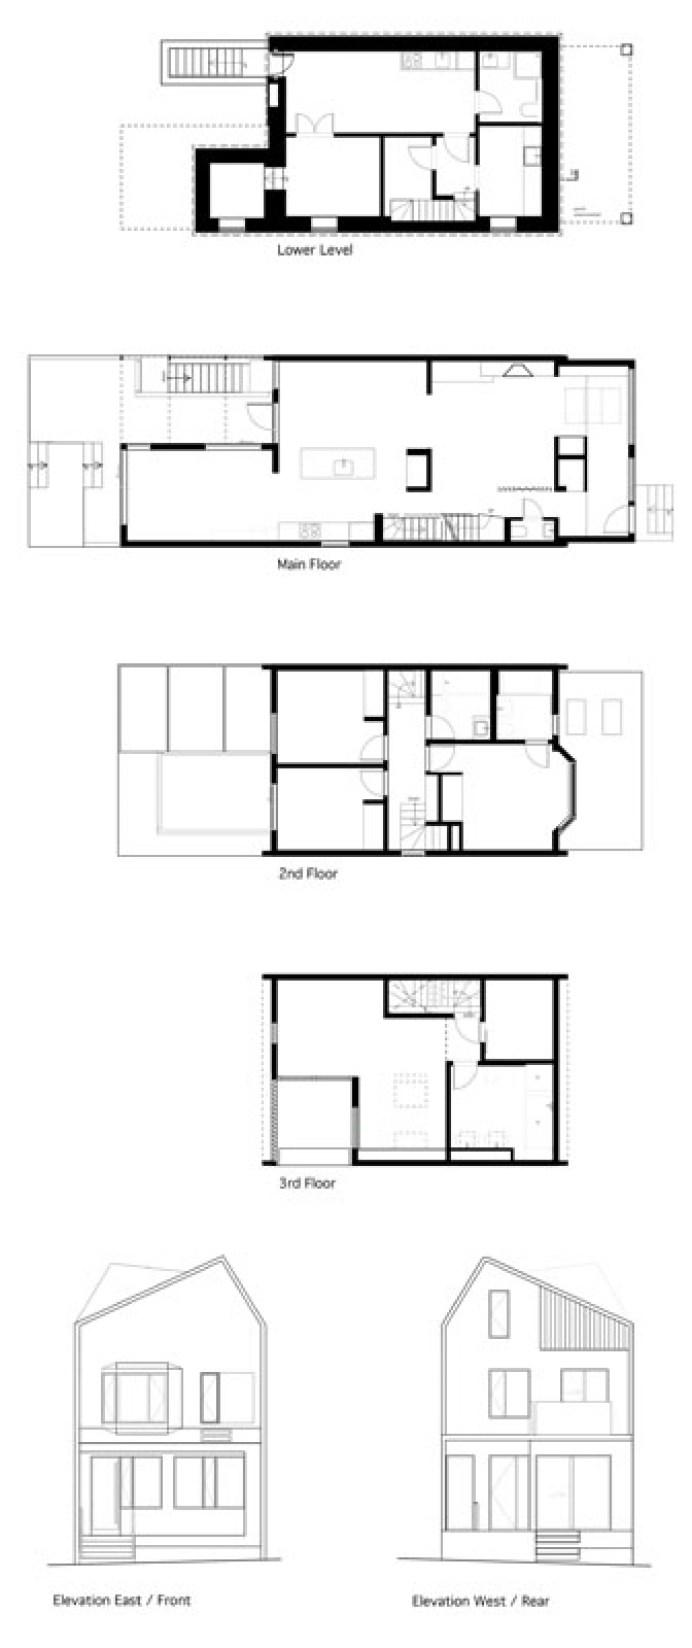 1905_Beaches_House-interior-kontaktmag-05